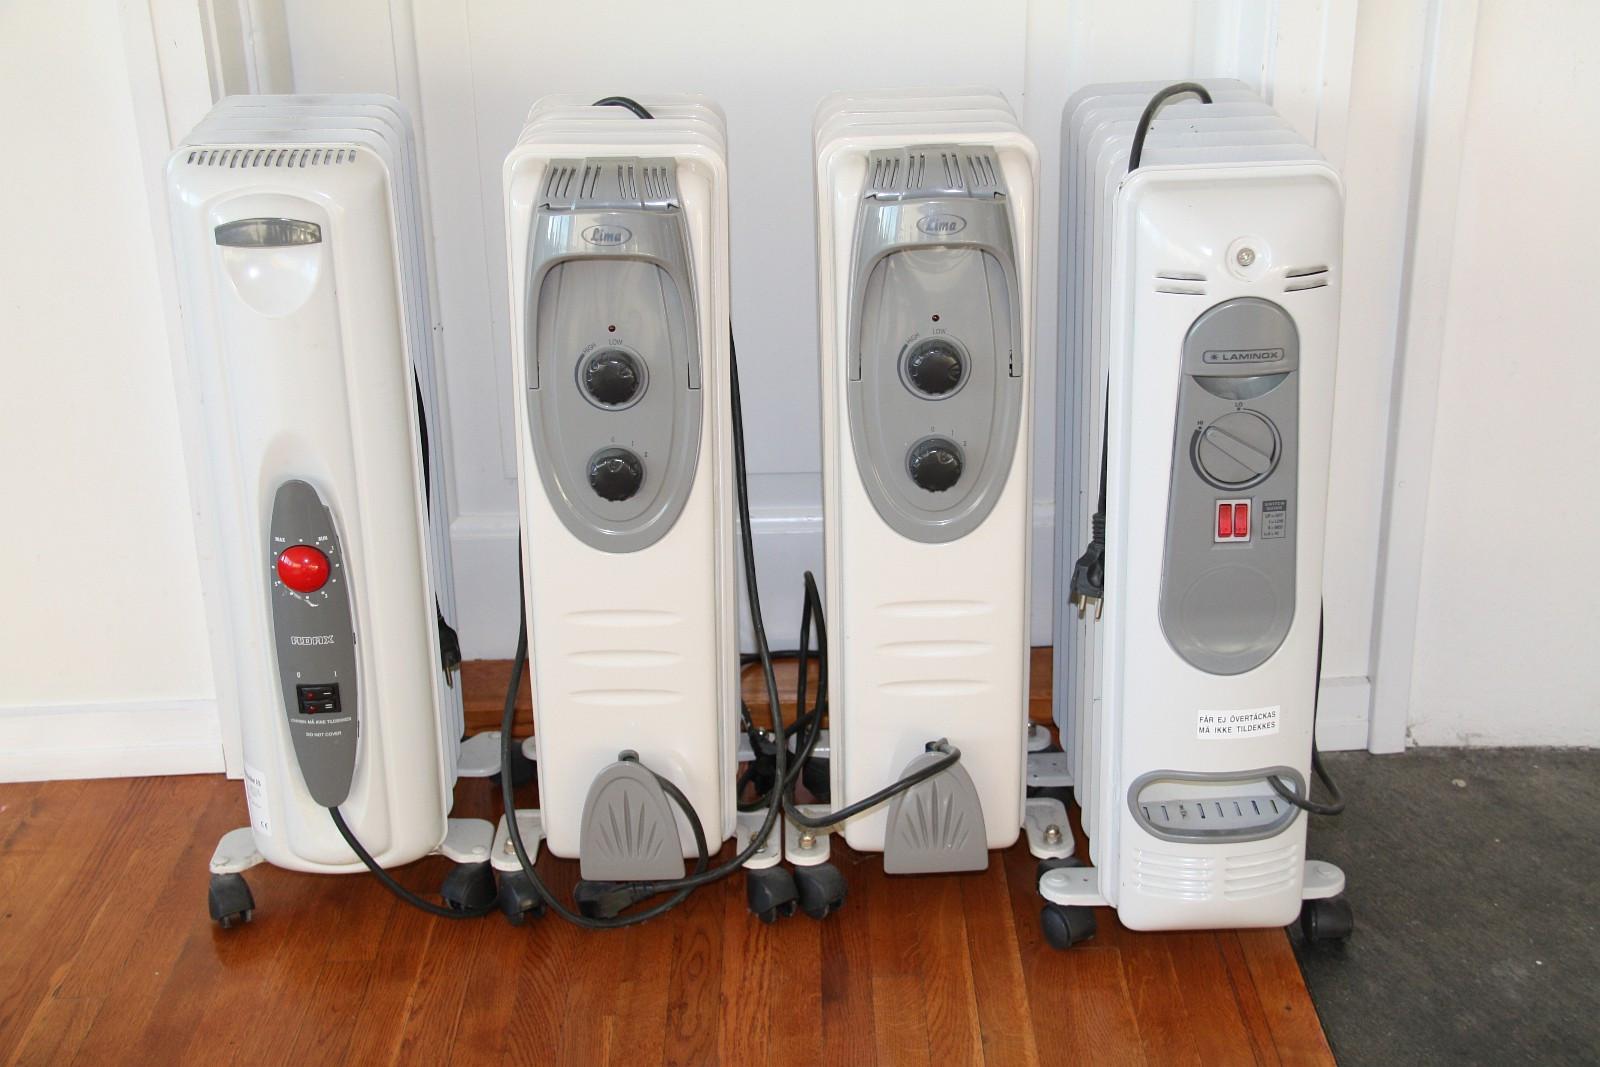 Flyttbar oljefylt radiator / oljeovn, 1000W og 1600W - 4 stk - Oslo  - Selger 4 flyttbare oljefylte radiatorer / oljeovner: 1 stk Laminox 1600W, 350 kr 2 stk Lima 1000W , 250 kr pr stk 1 stk Adax 1000W, 250 kr  Røyk- og dyrefritt hjem.  Kan hentes på Smestad.&# - Oslo